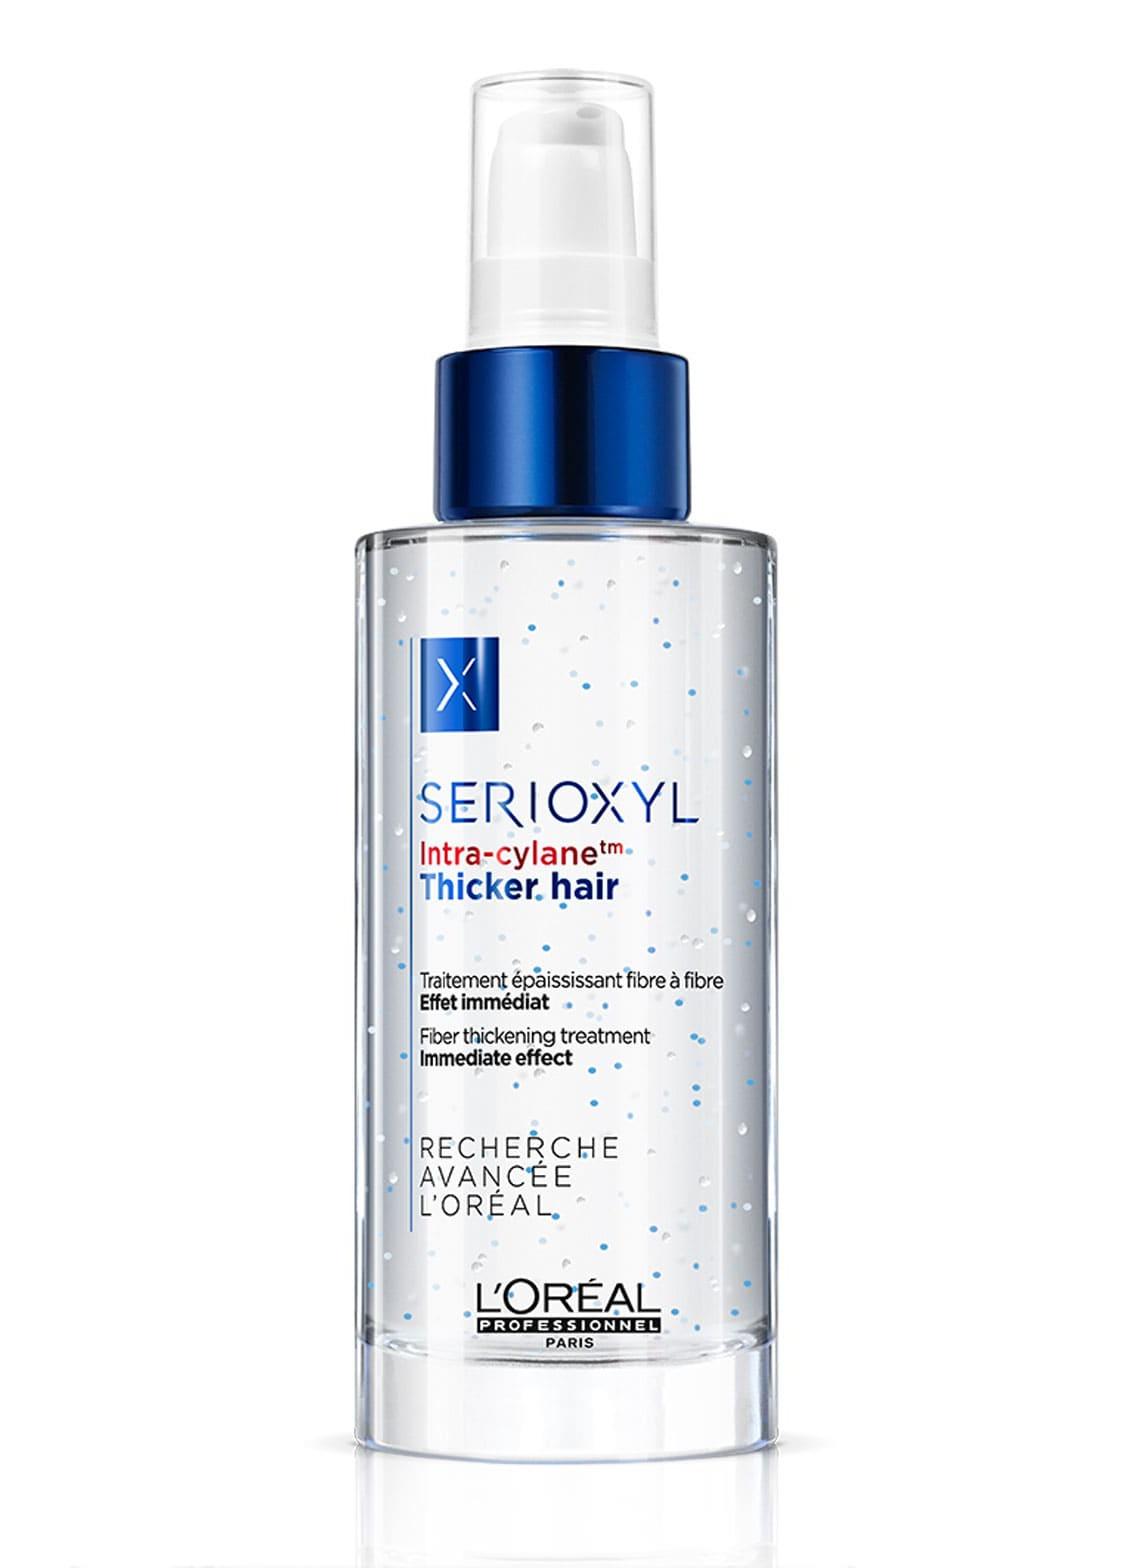 L'Oreal Professionnel Serioxyl Thicker Hair Serum